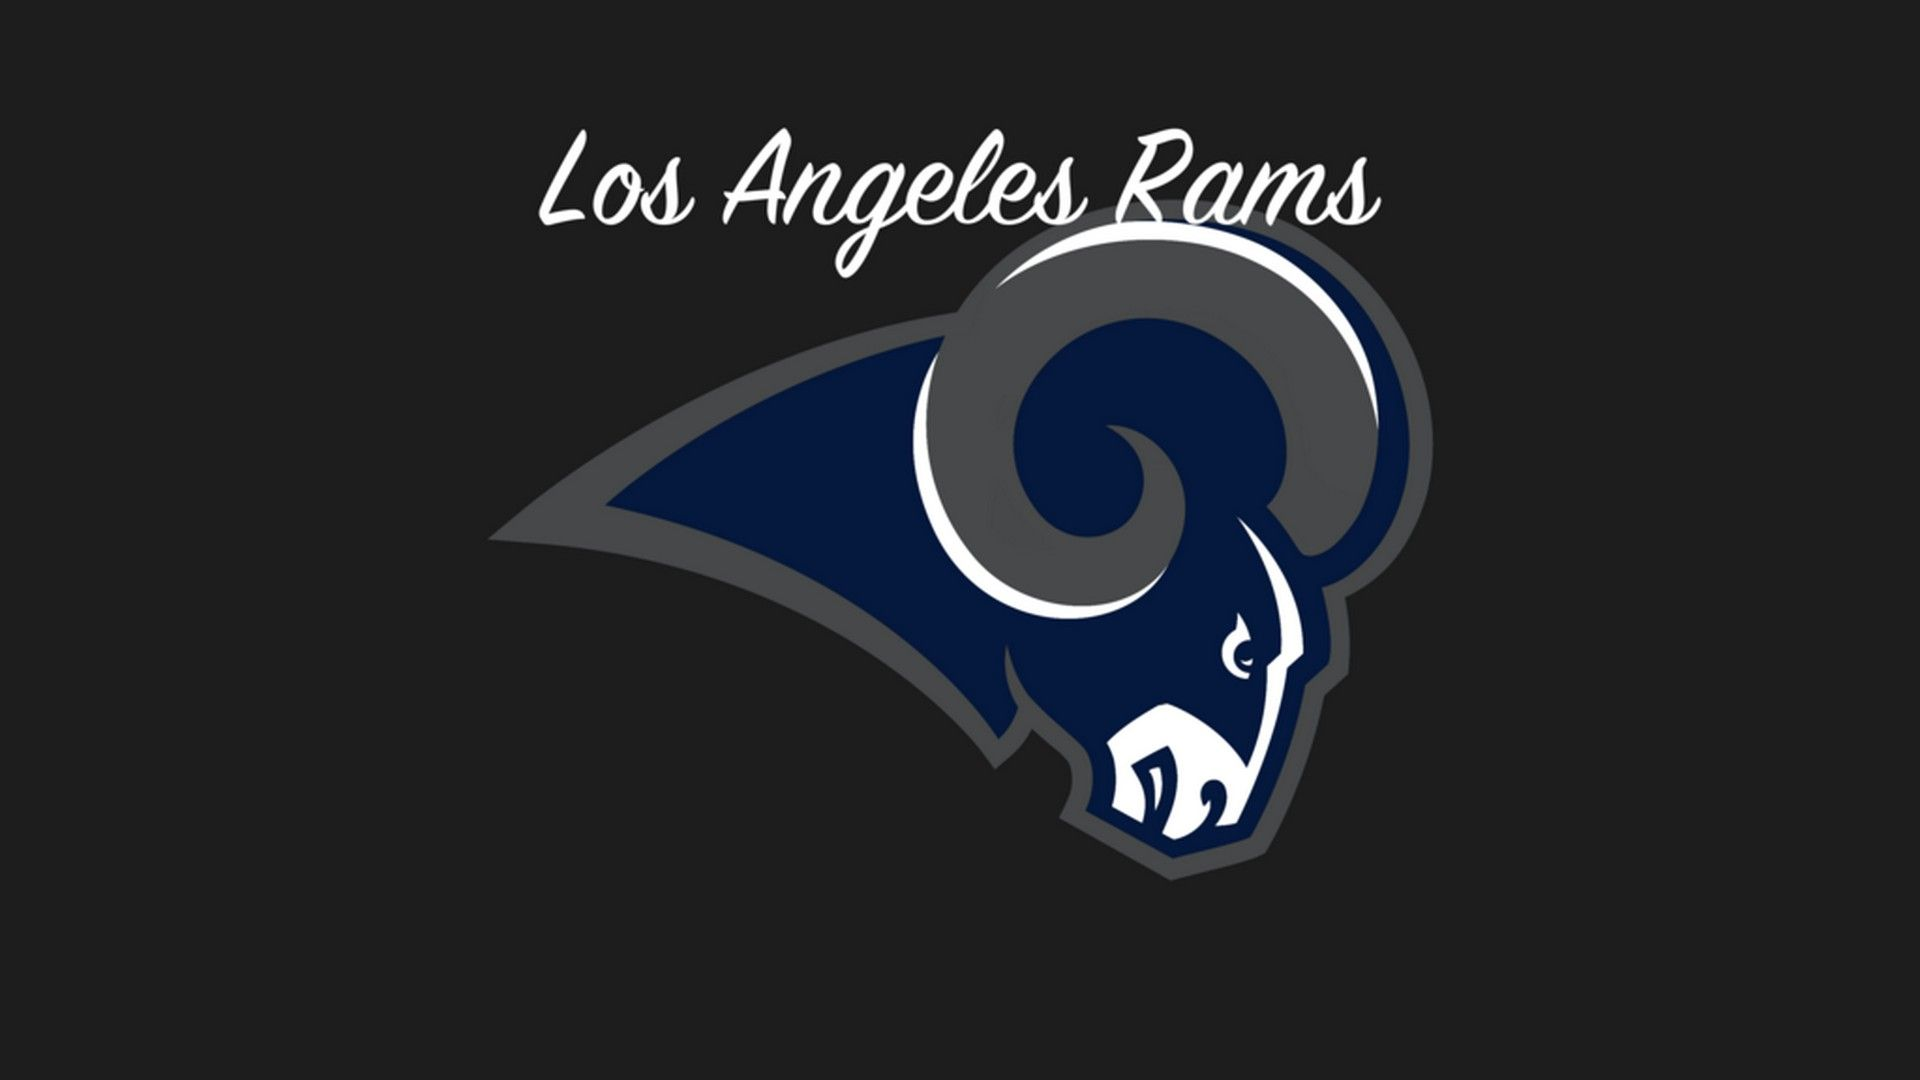 Los Angeles Rams Hd Wallpapers Wallpaper Football Wallpaper Hd Wallpaper Nfl Football